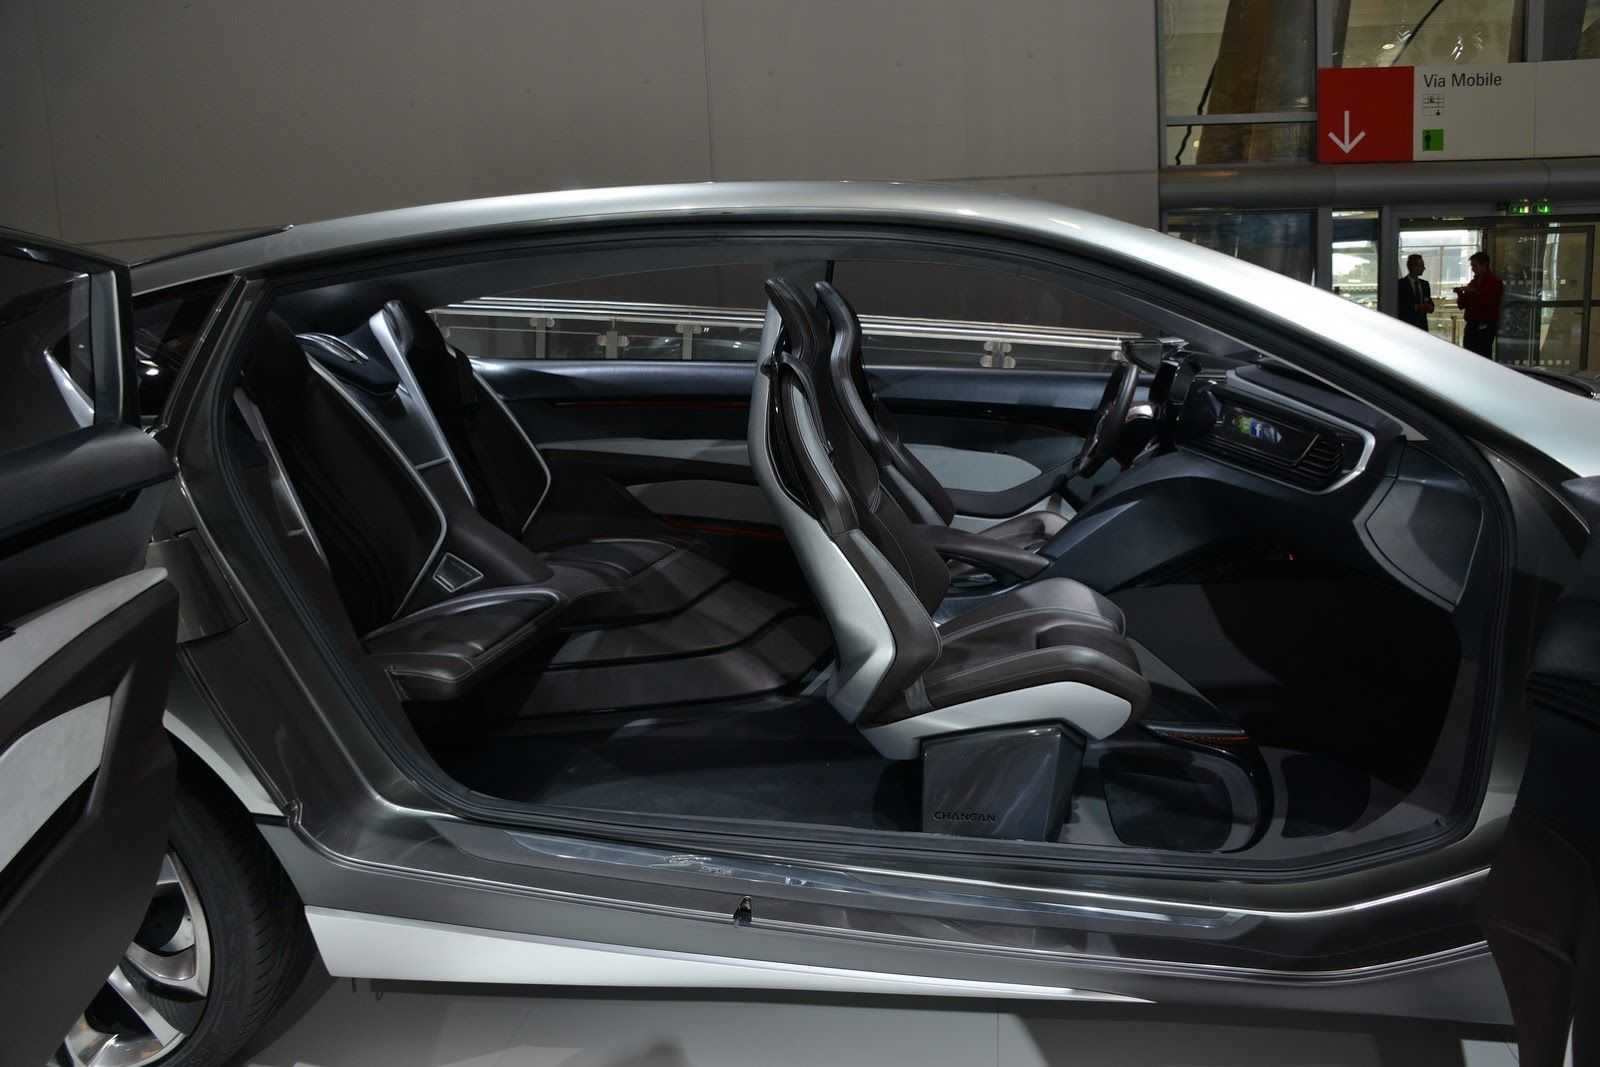 Changan Cs95 Inside With Images Chang An Car Interior Sports Car